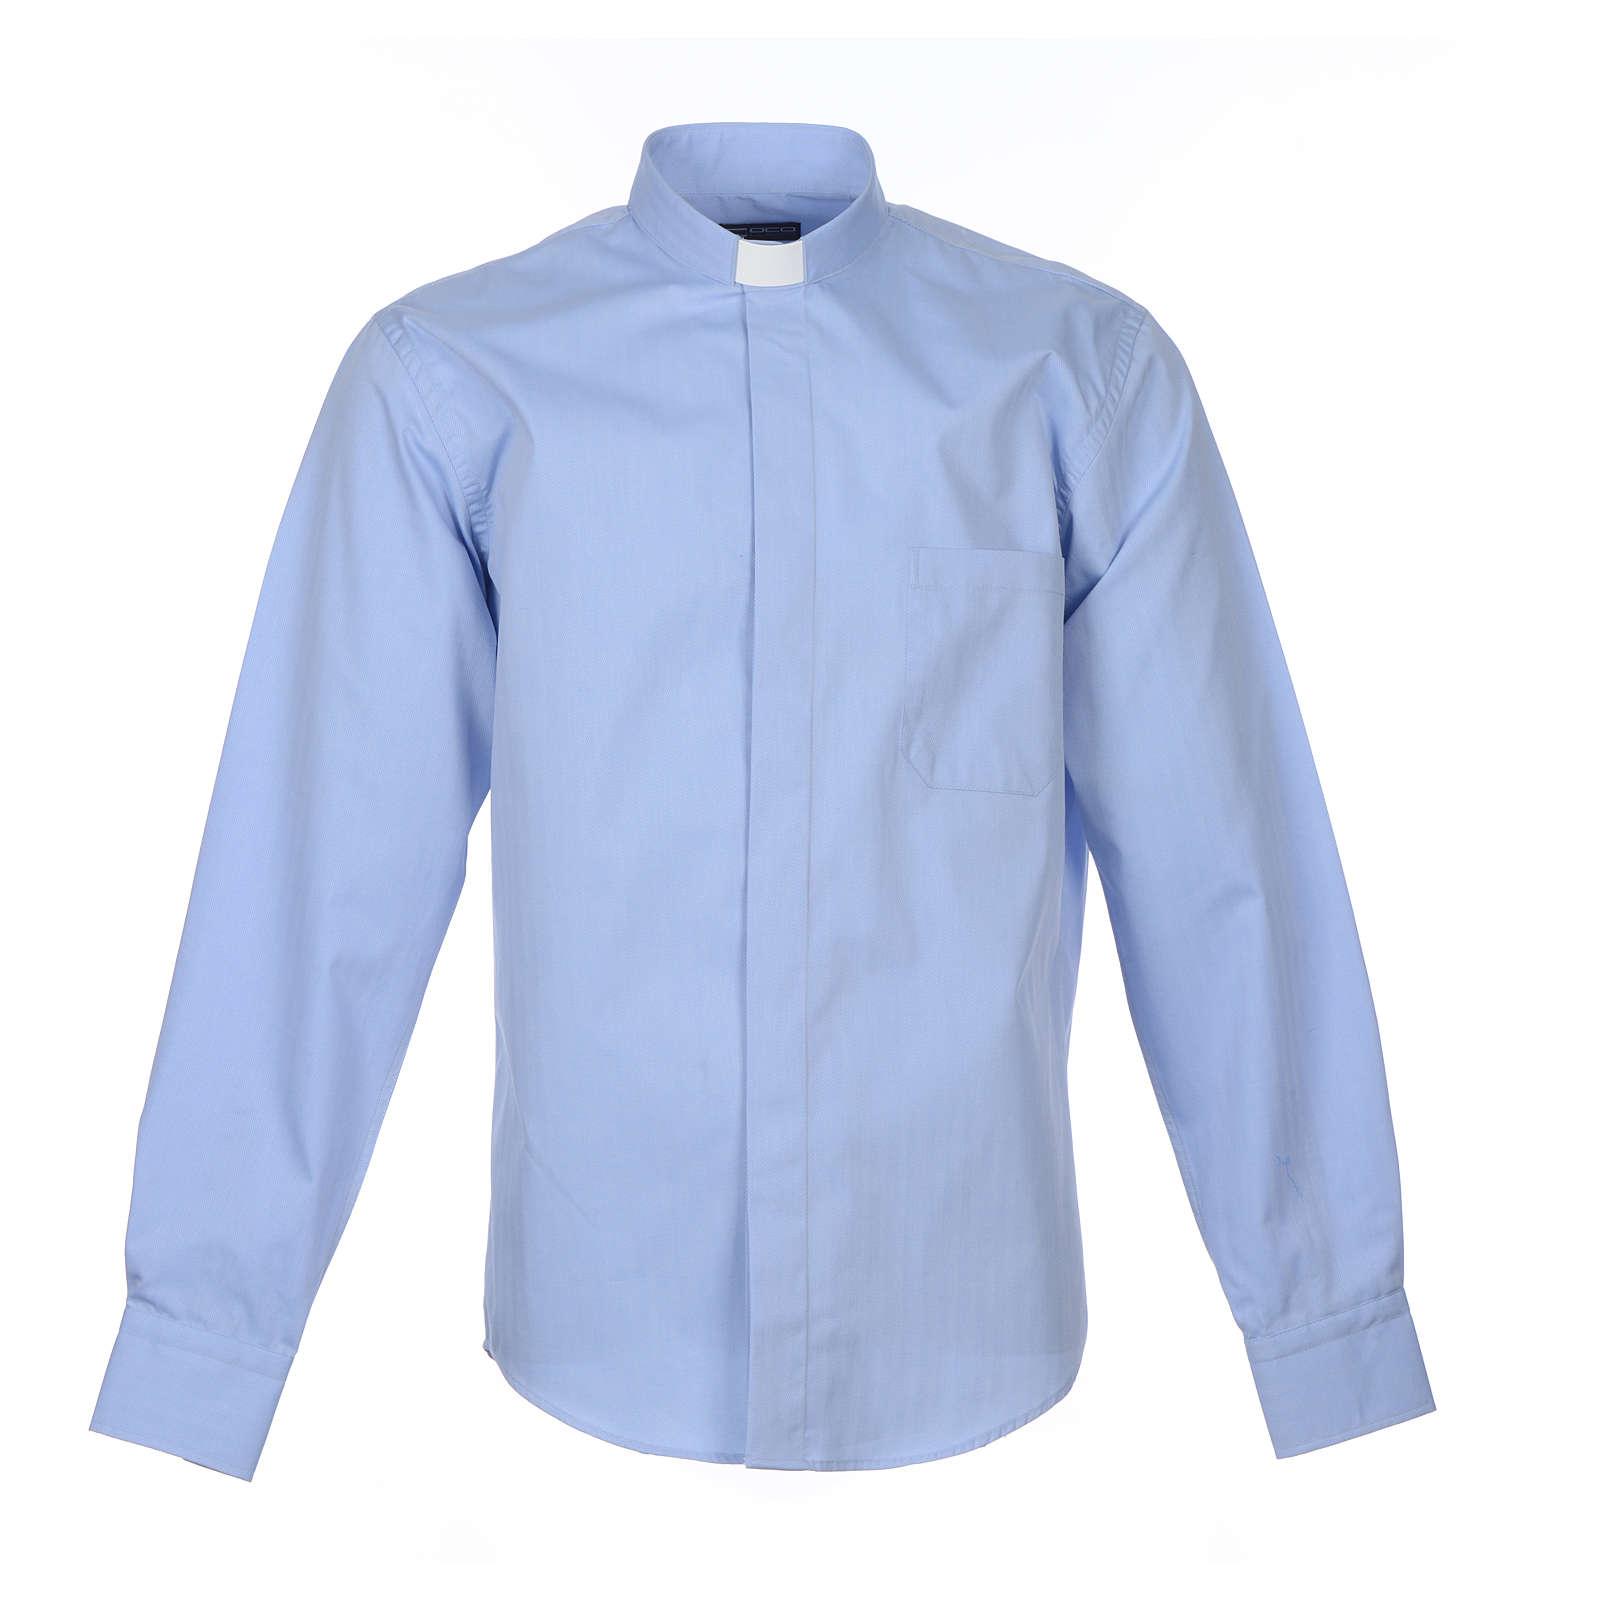 Camicia clergy M. Lunga Facile stiro Spigato Misto cotone Celeste 4